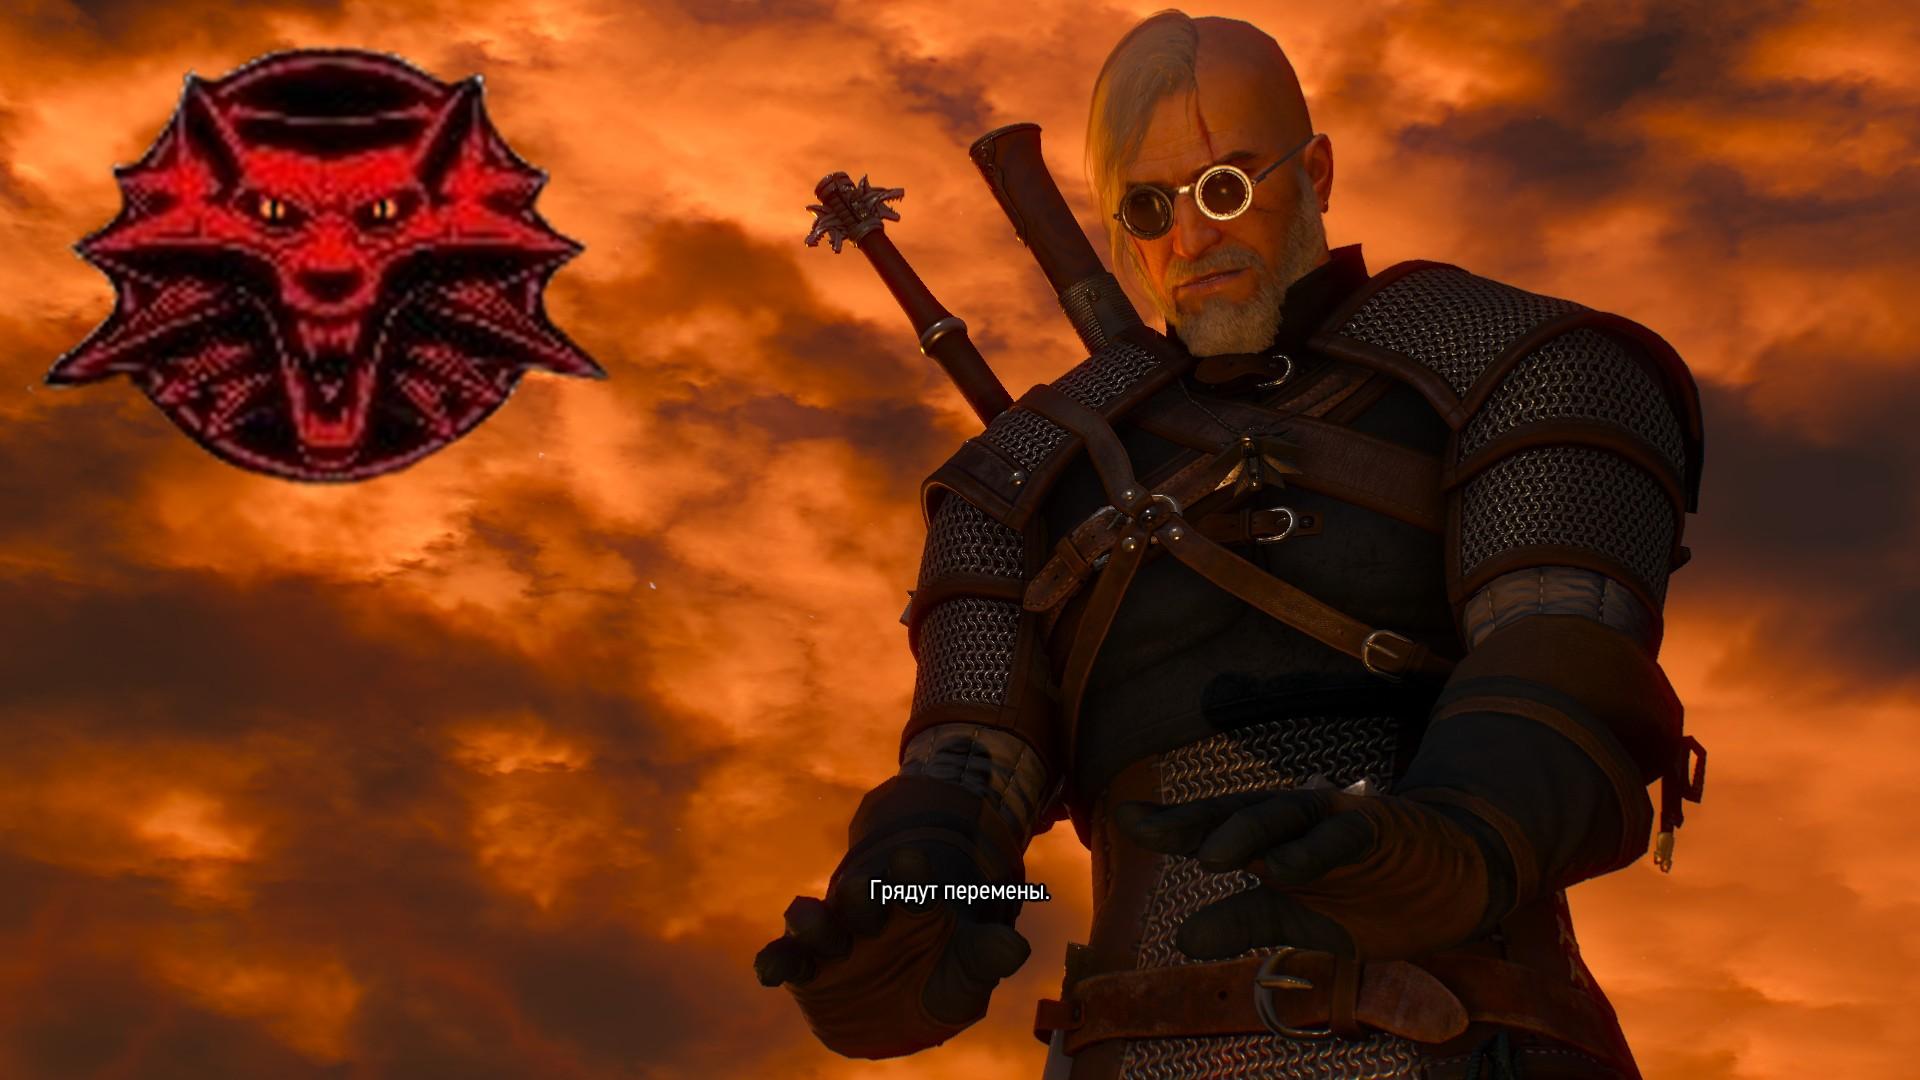 +Атаман Гер2.jpg - Witcher 3: Wild Hunt, the